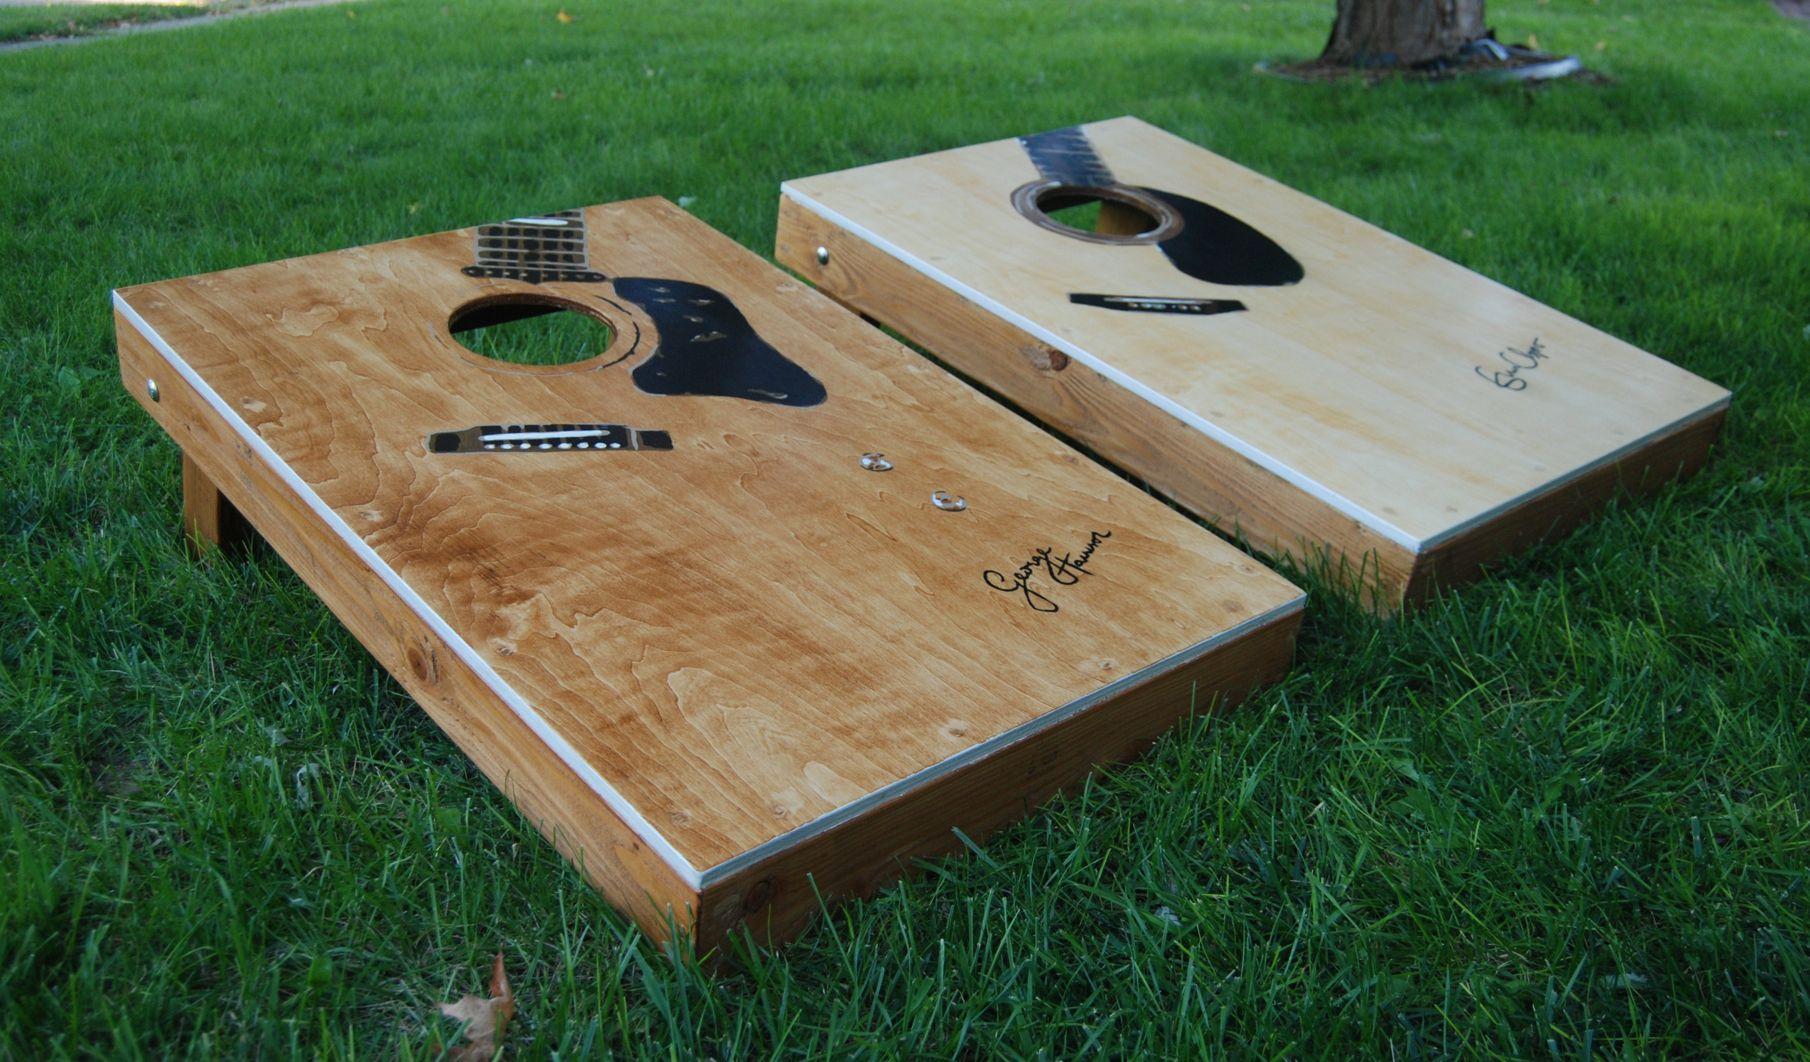 Hand Painted Guitar Boards • Cornhole Players Cornhole